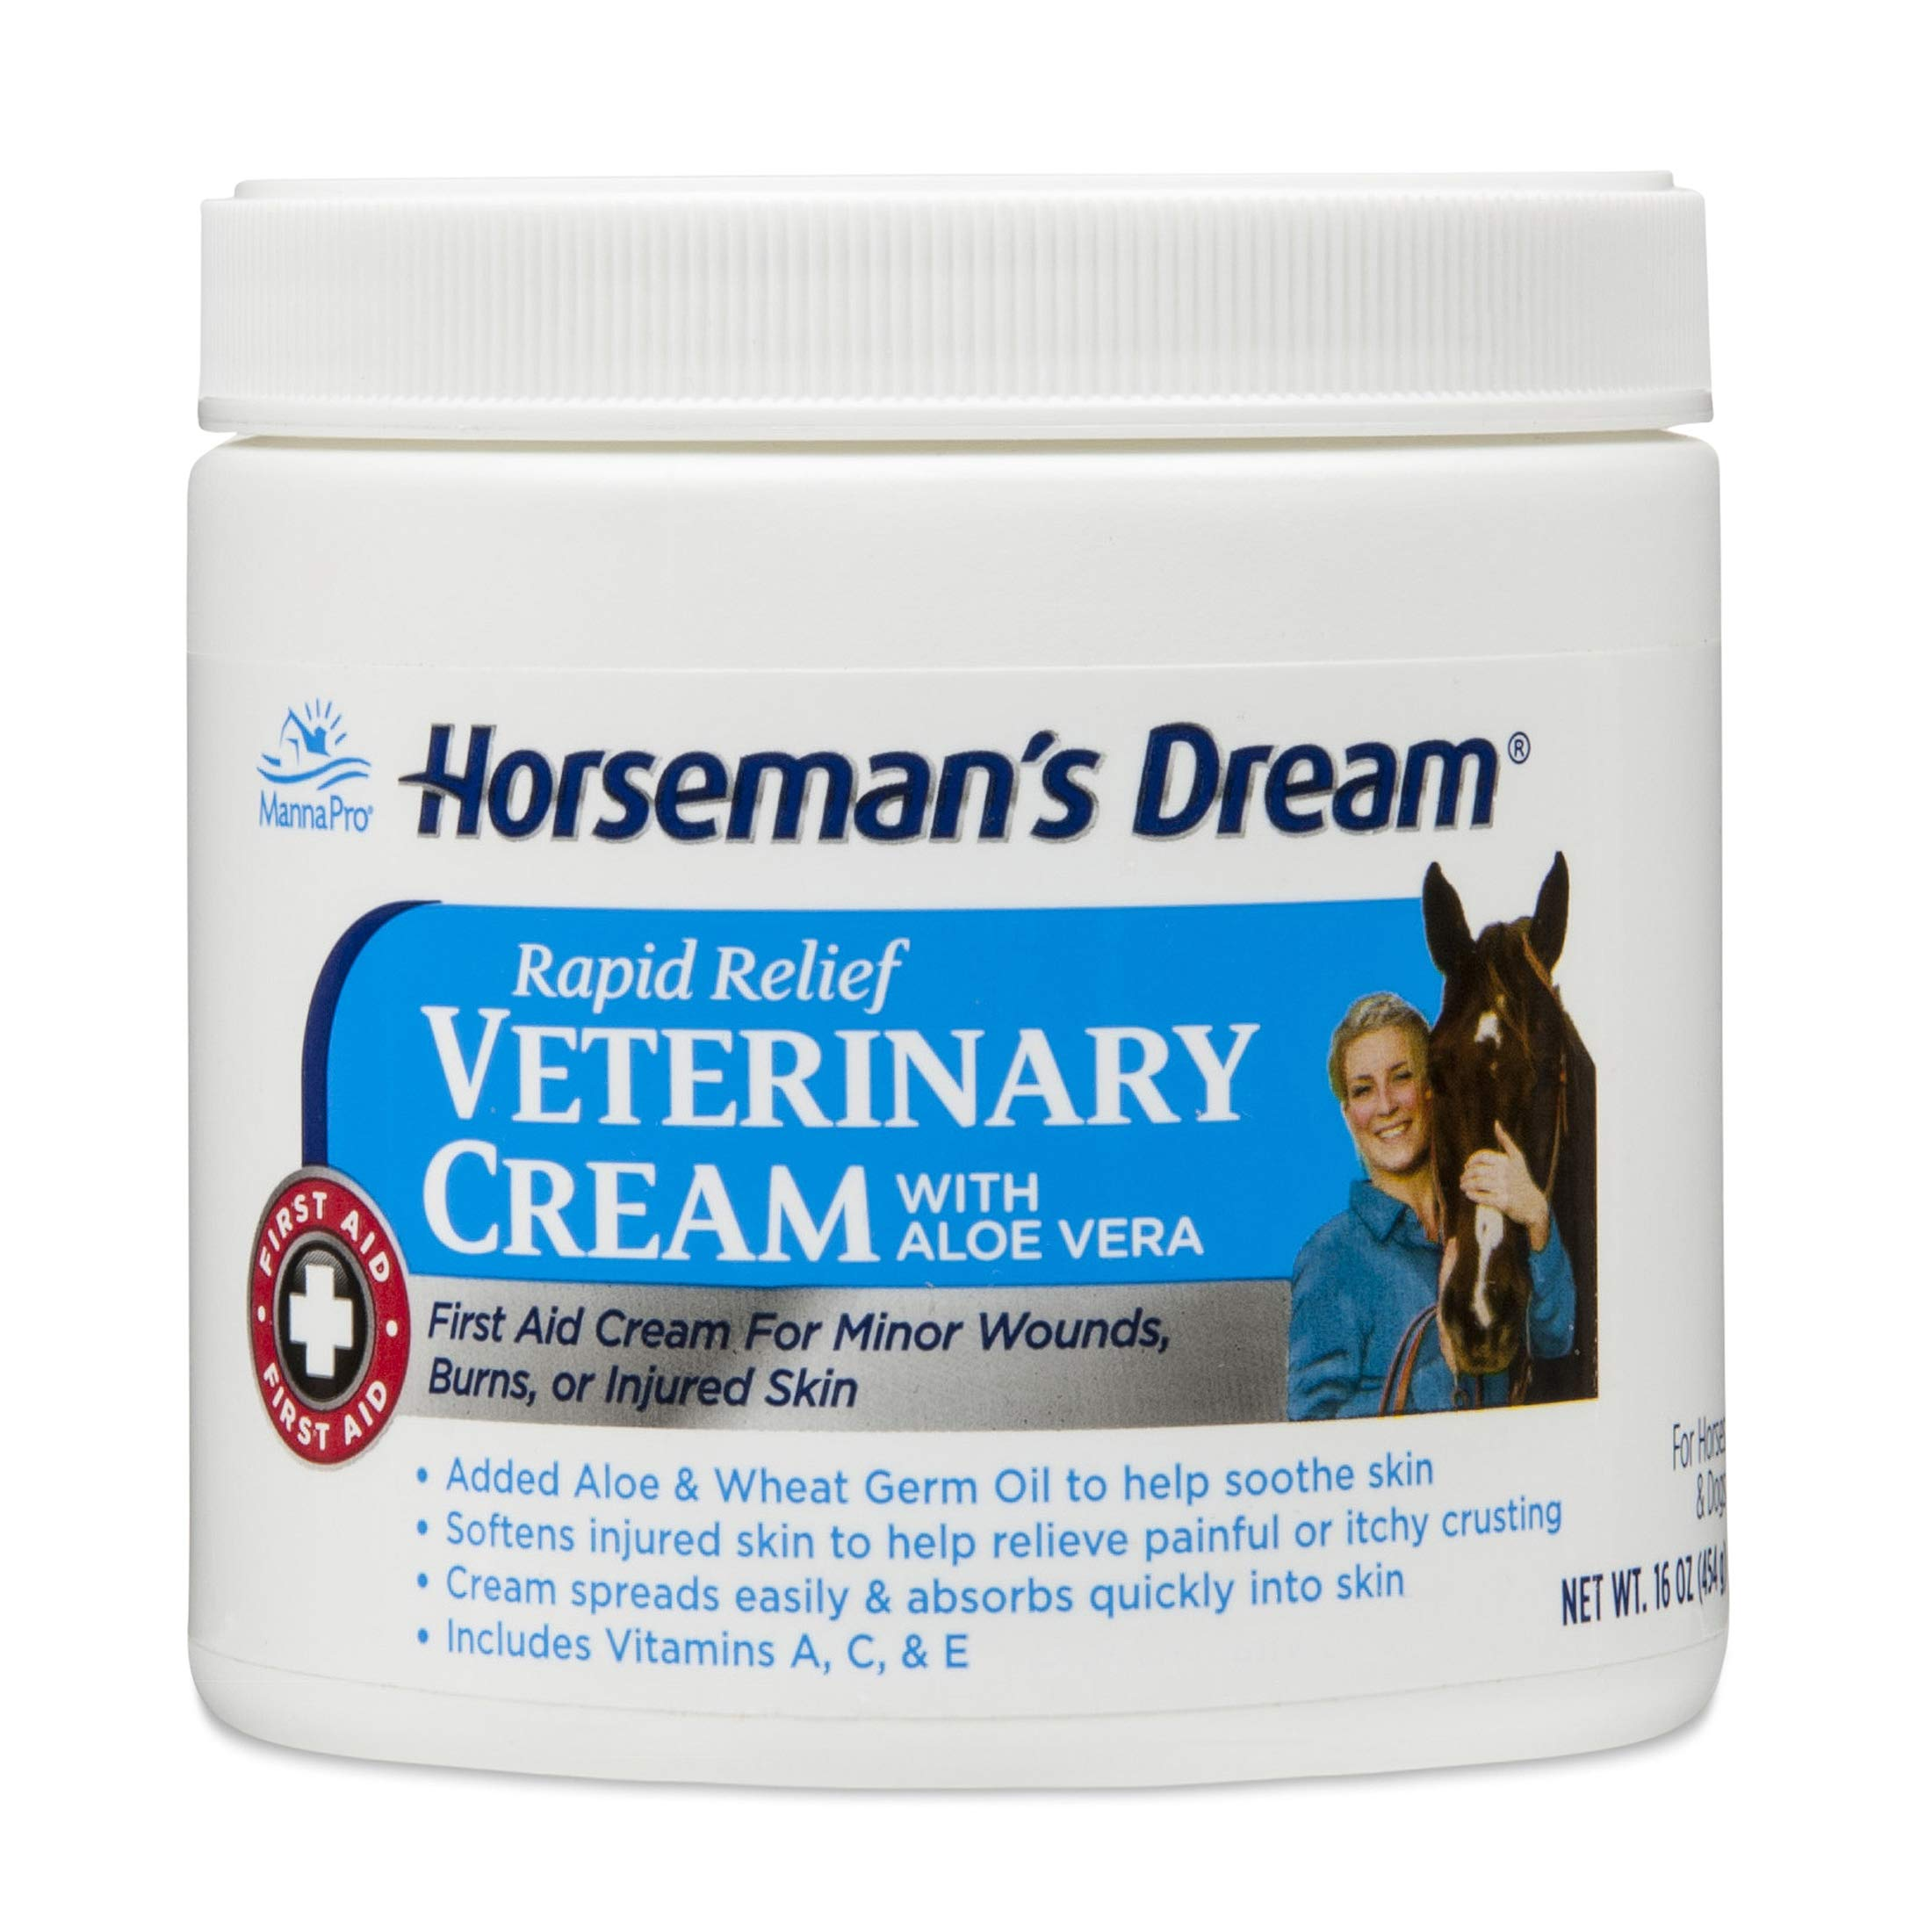 Manna Pro Horseman's Dream Veterinary Cream, Jar, 16-Ounces by Manna Pro